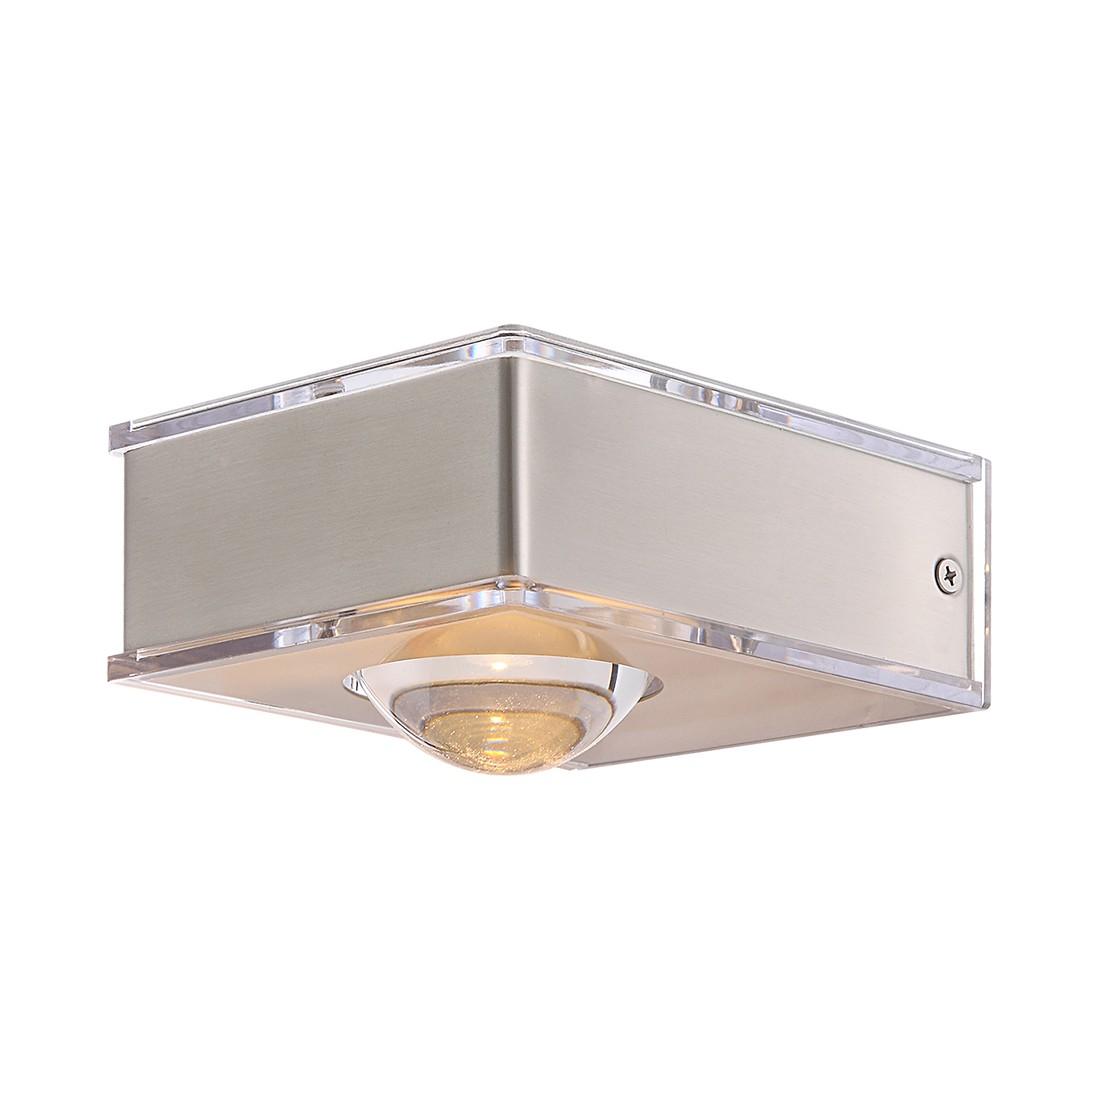 Außenleuchte Upndown IV ● Silber ● Edelstahl- Globo Lighting A+